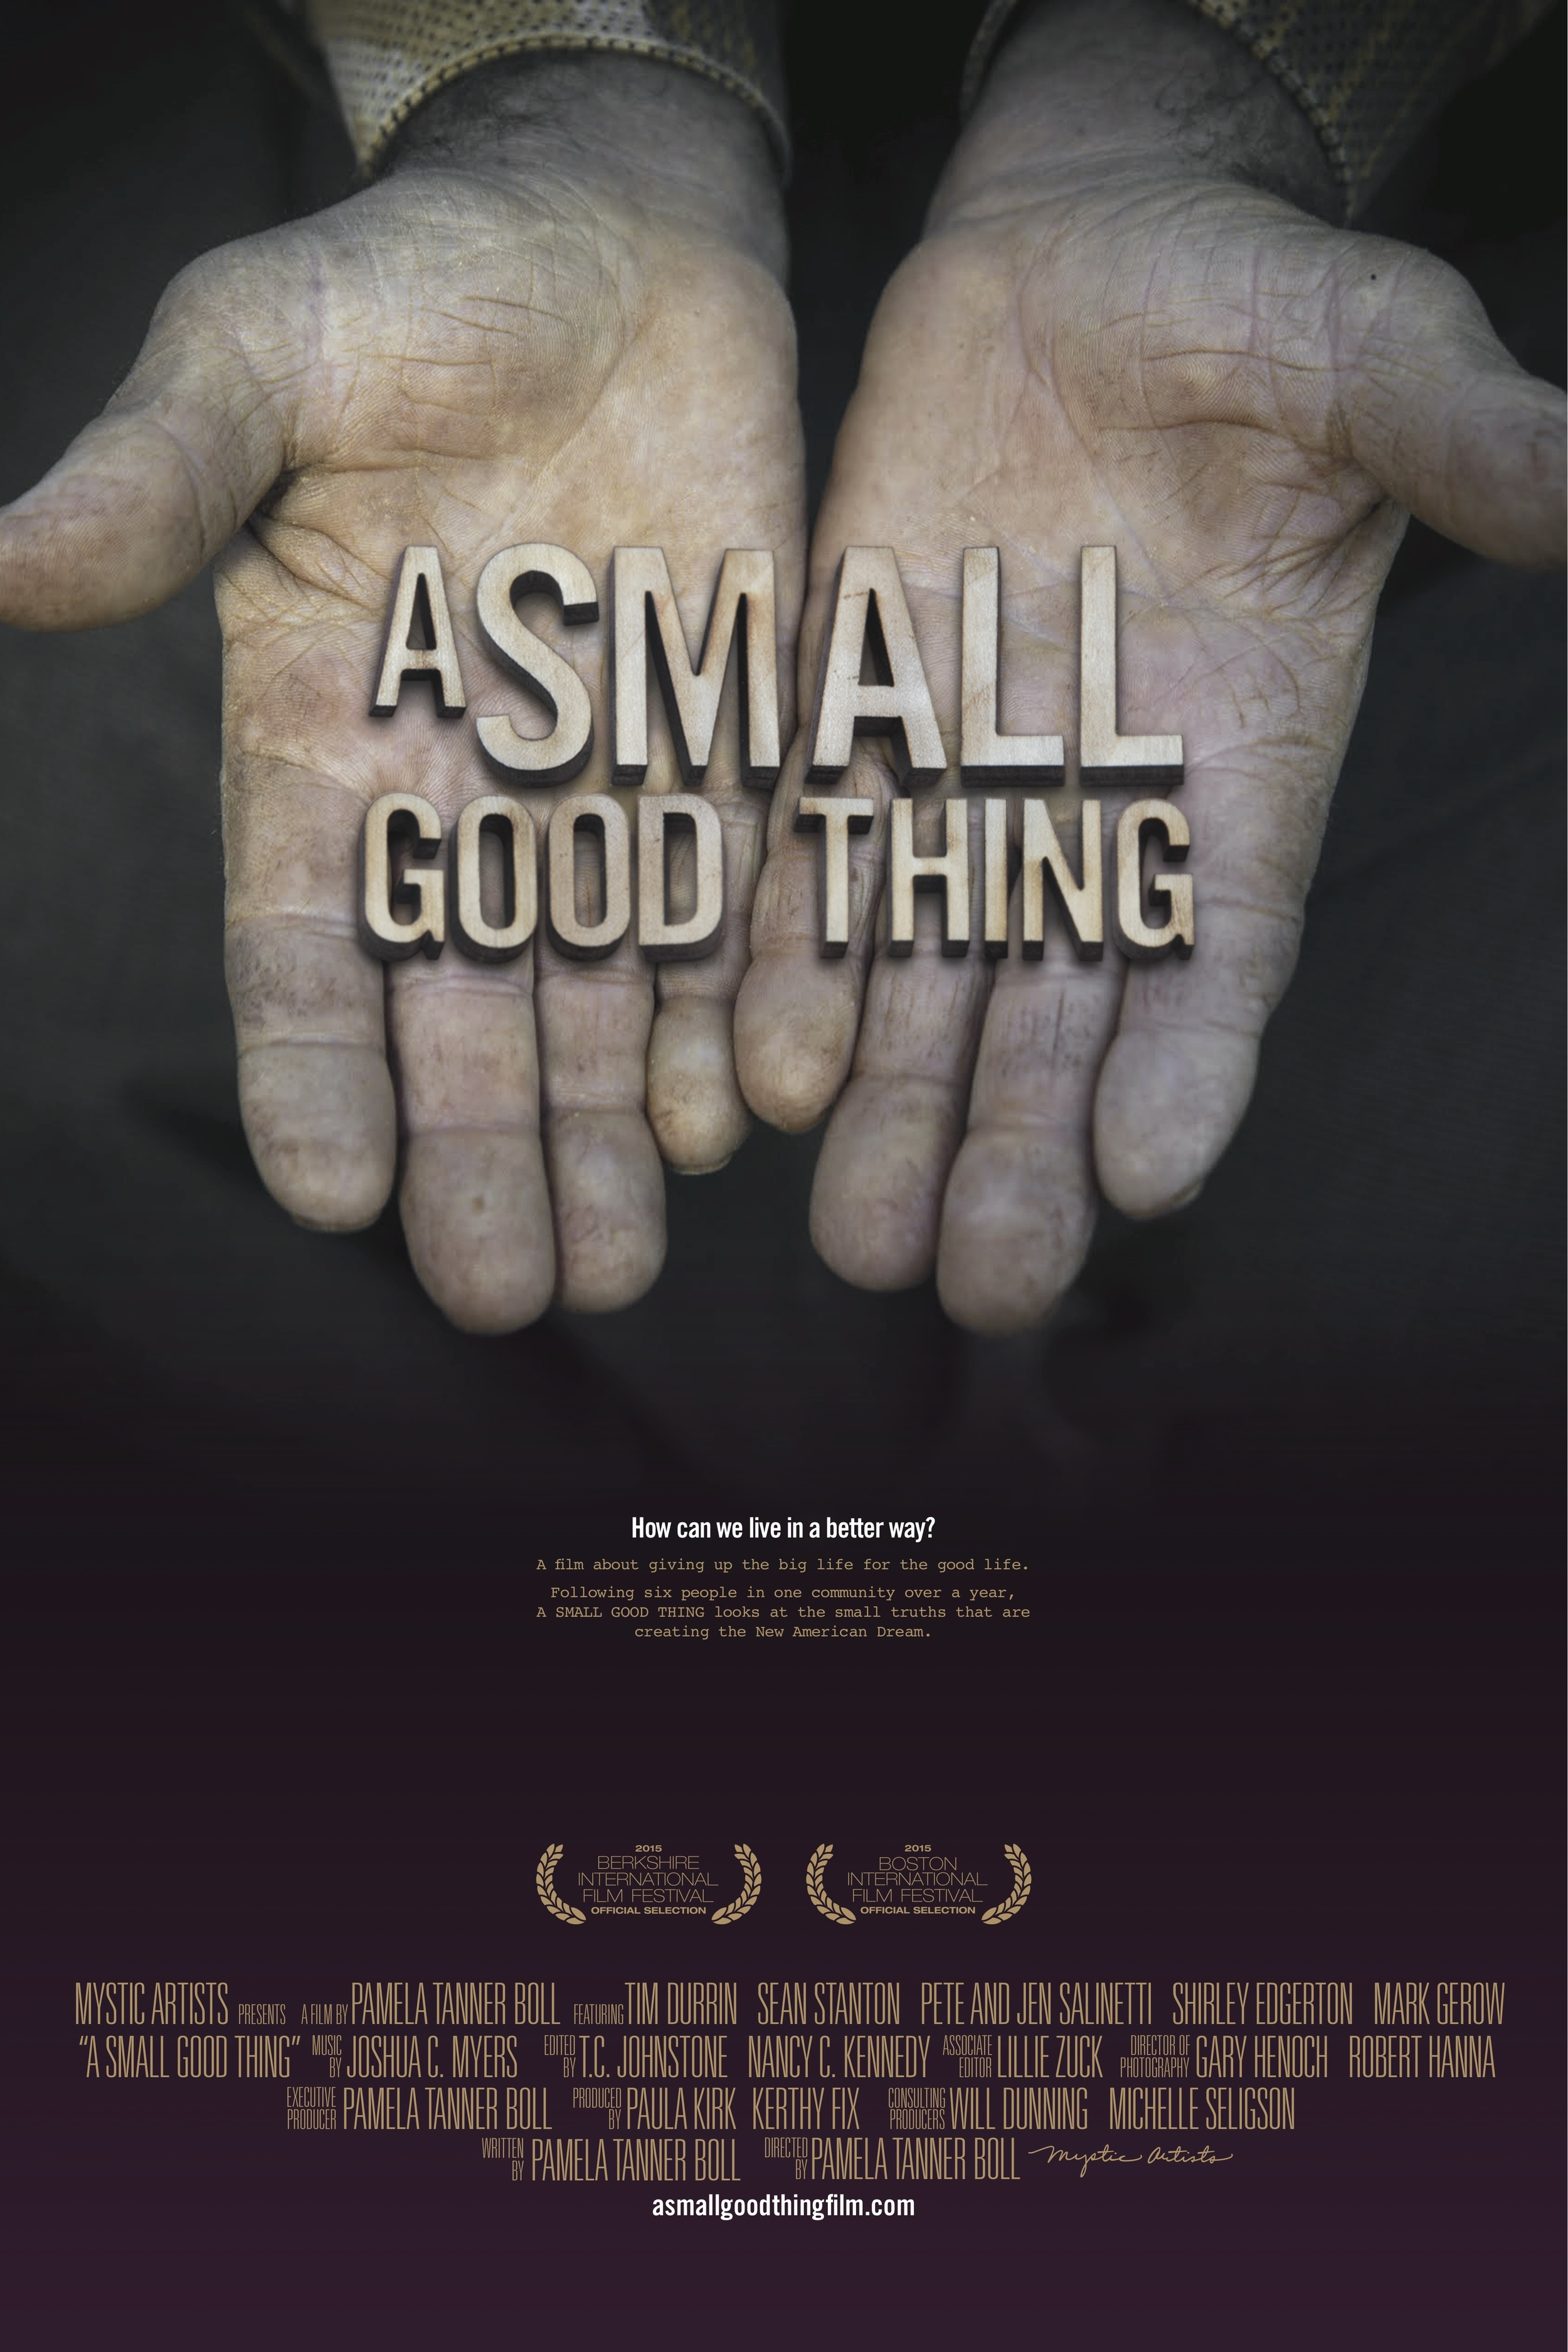 A-SMALL-GOOD-THING.jpg